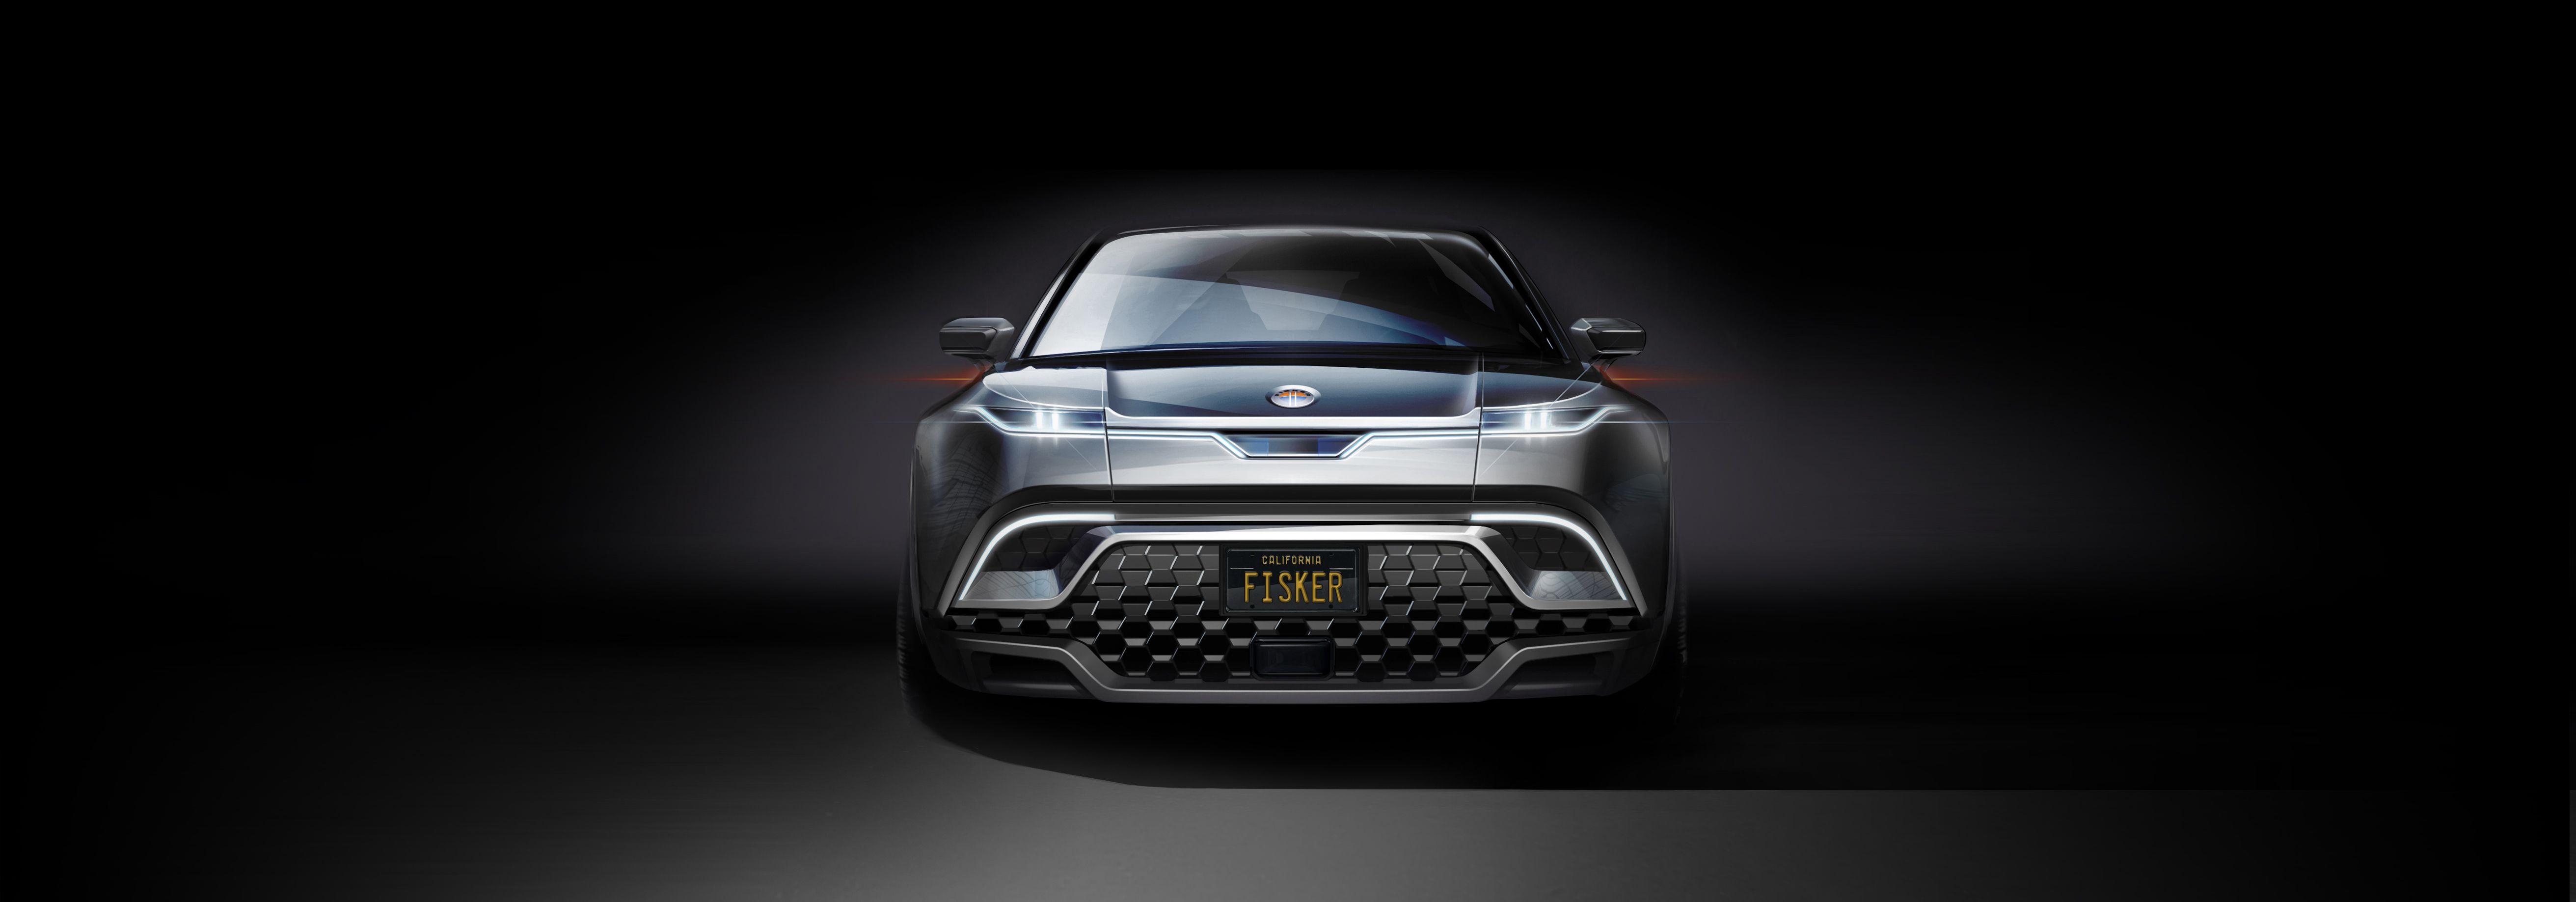 Tesla Model Y gets Fisker Inc. rival Tesla model, Tesla